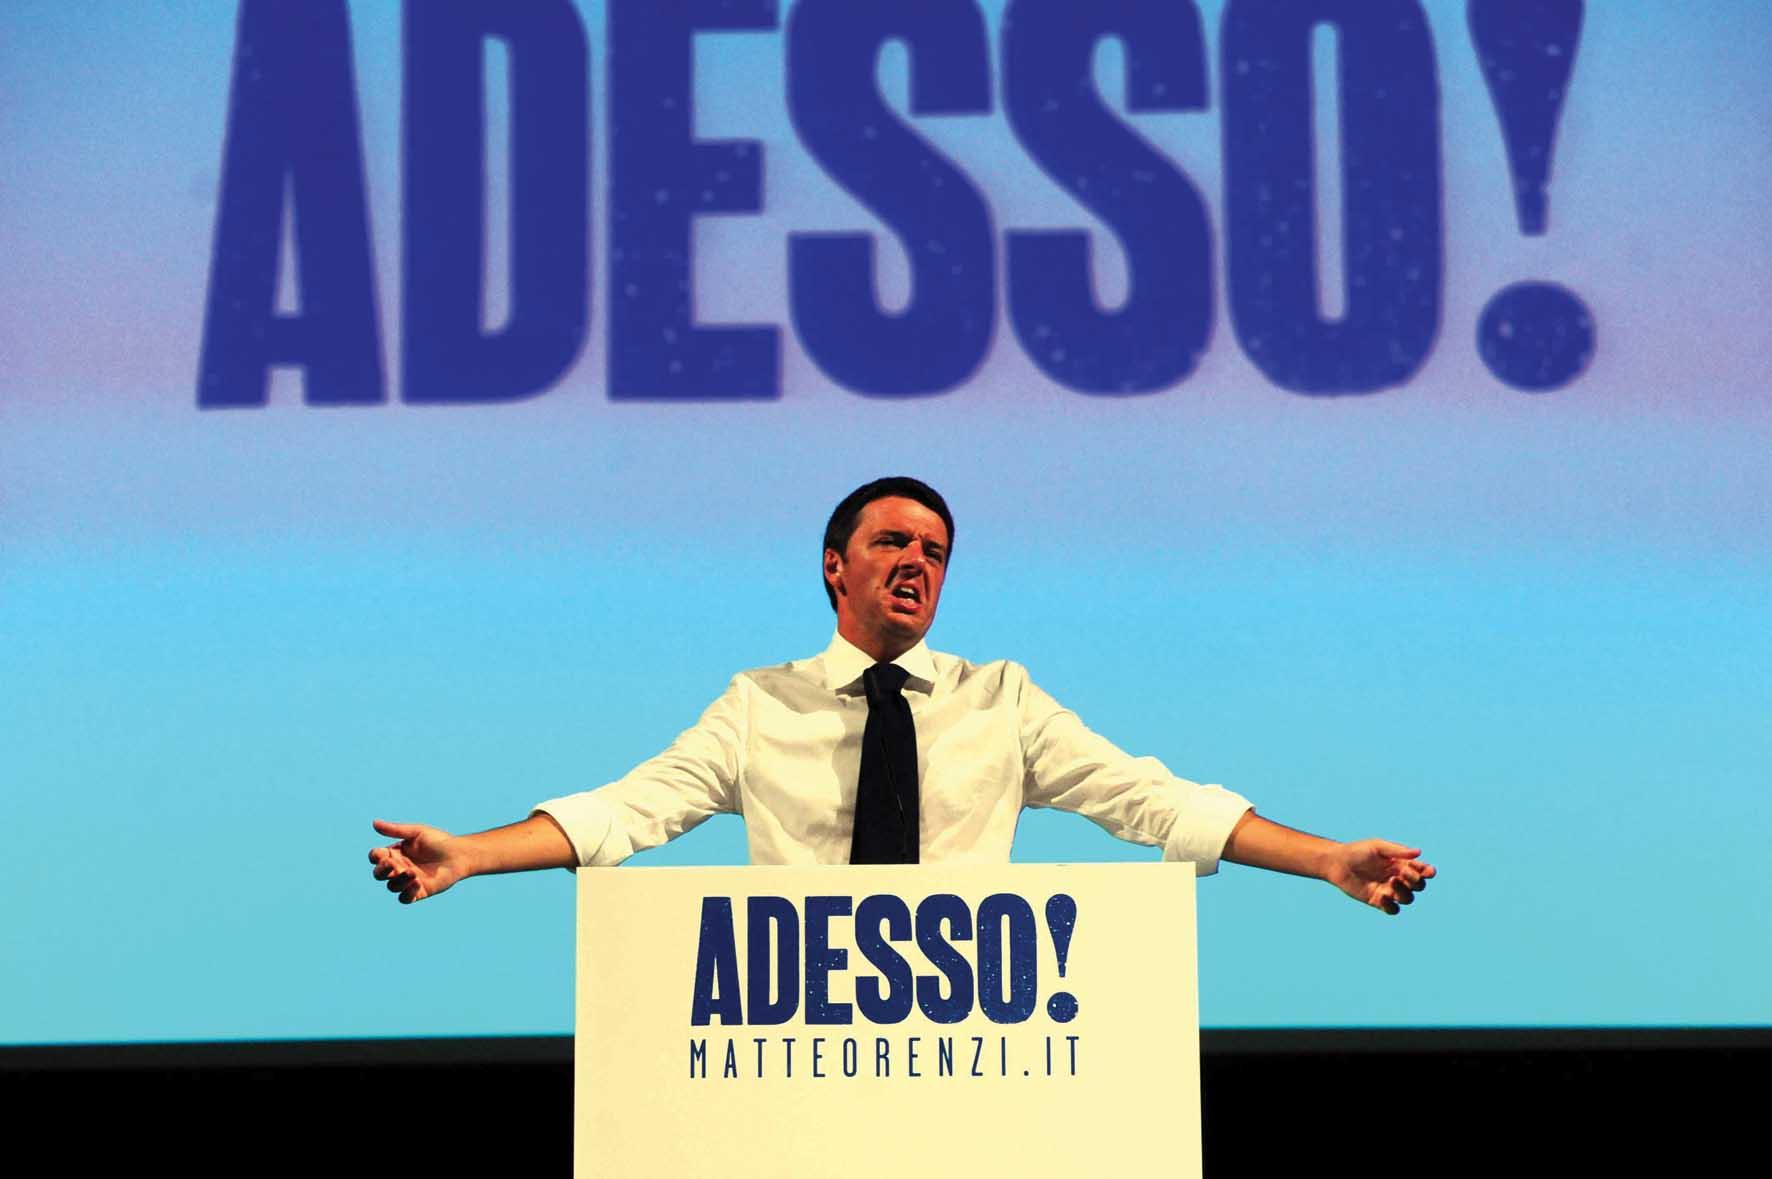 mattero renzi campagna primarie palco 1